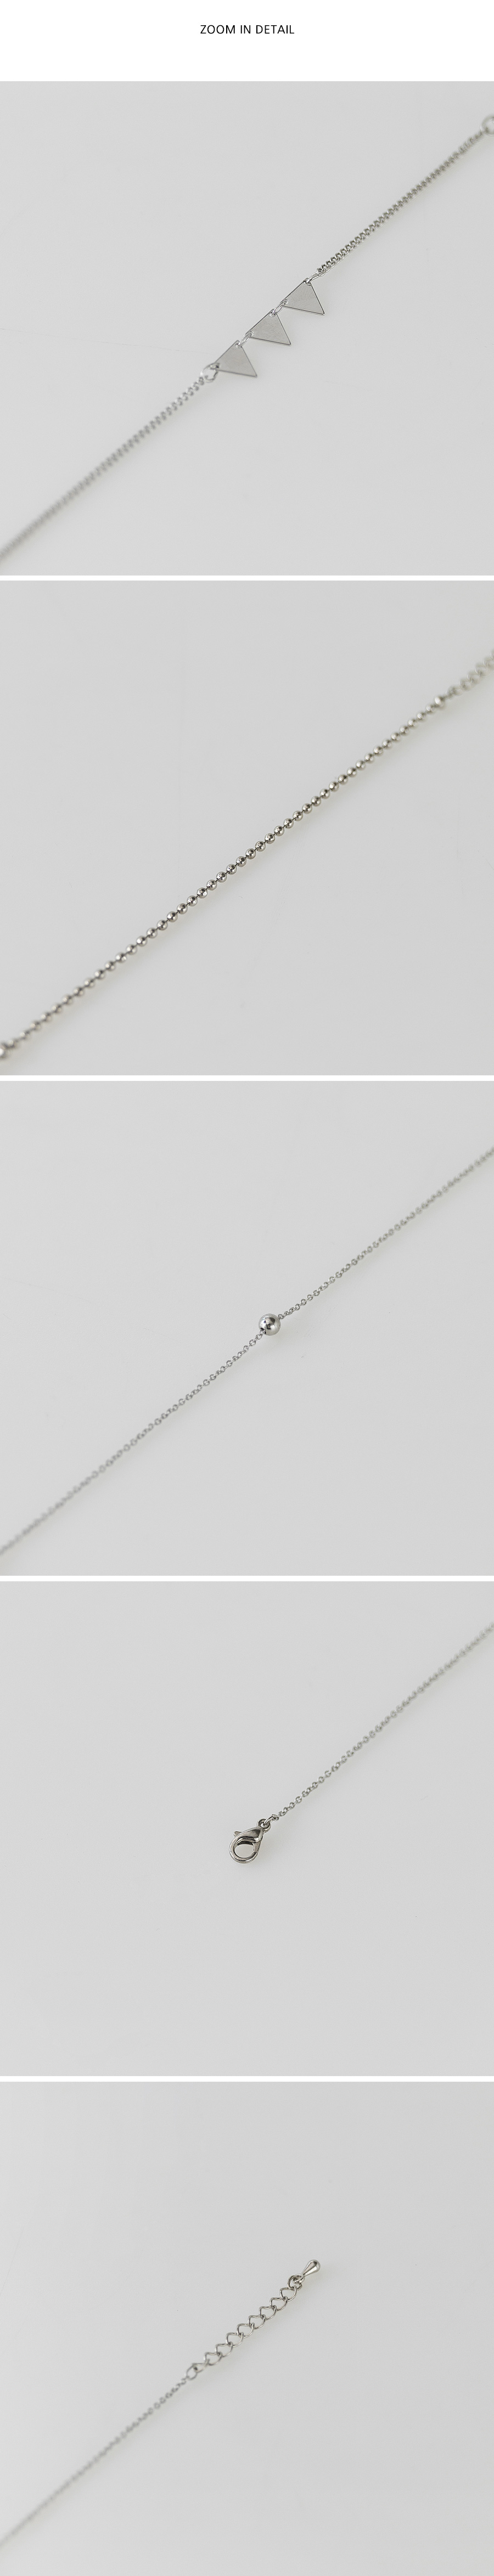 3 types layered bracelet